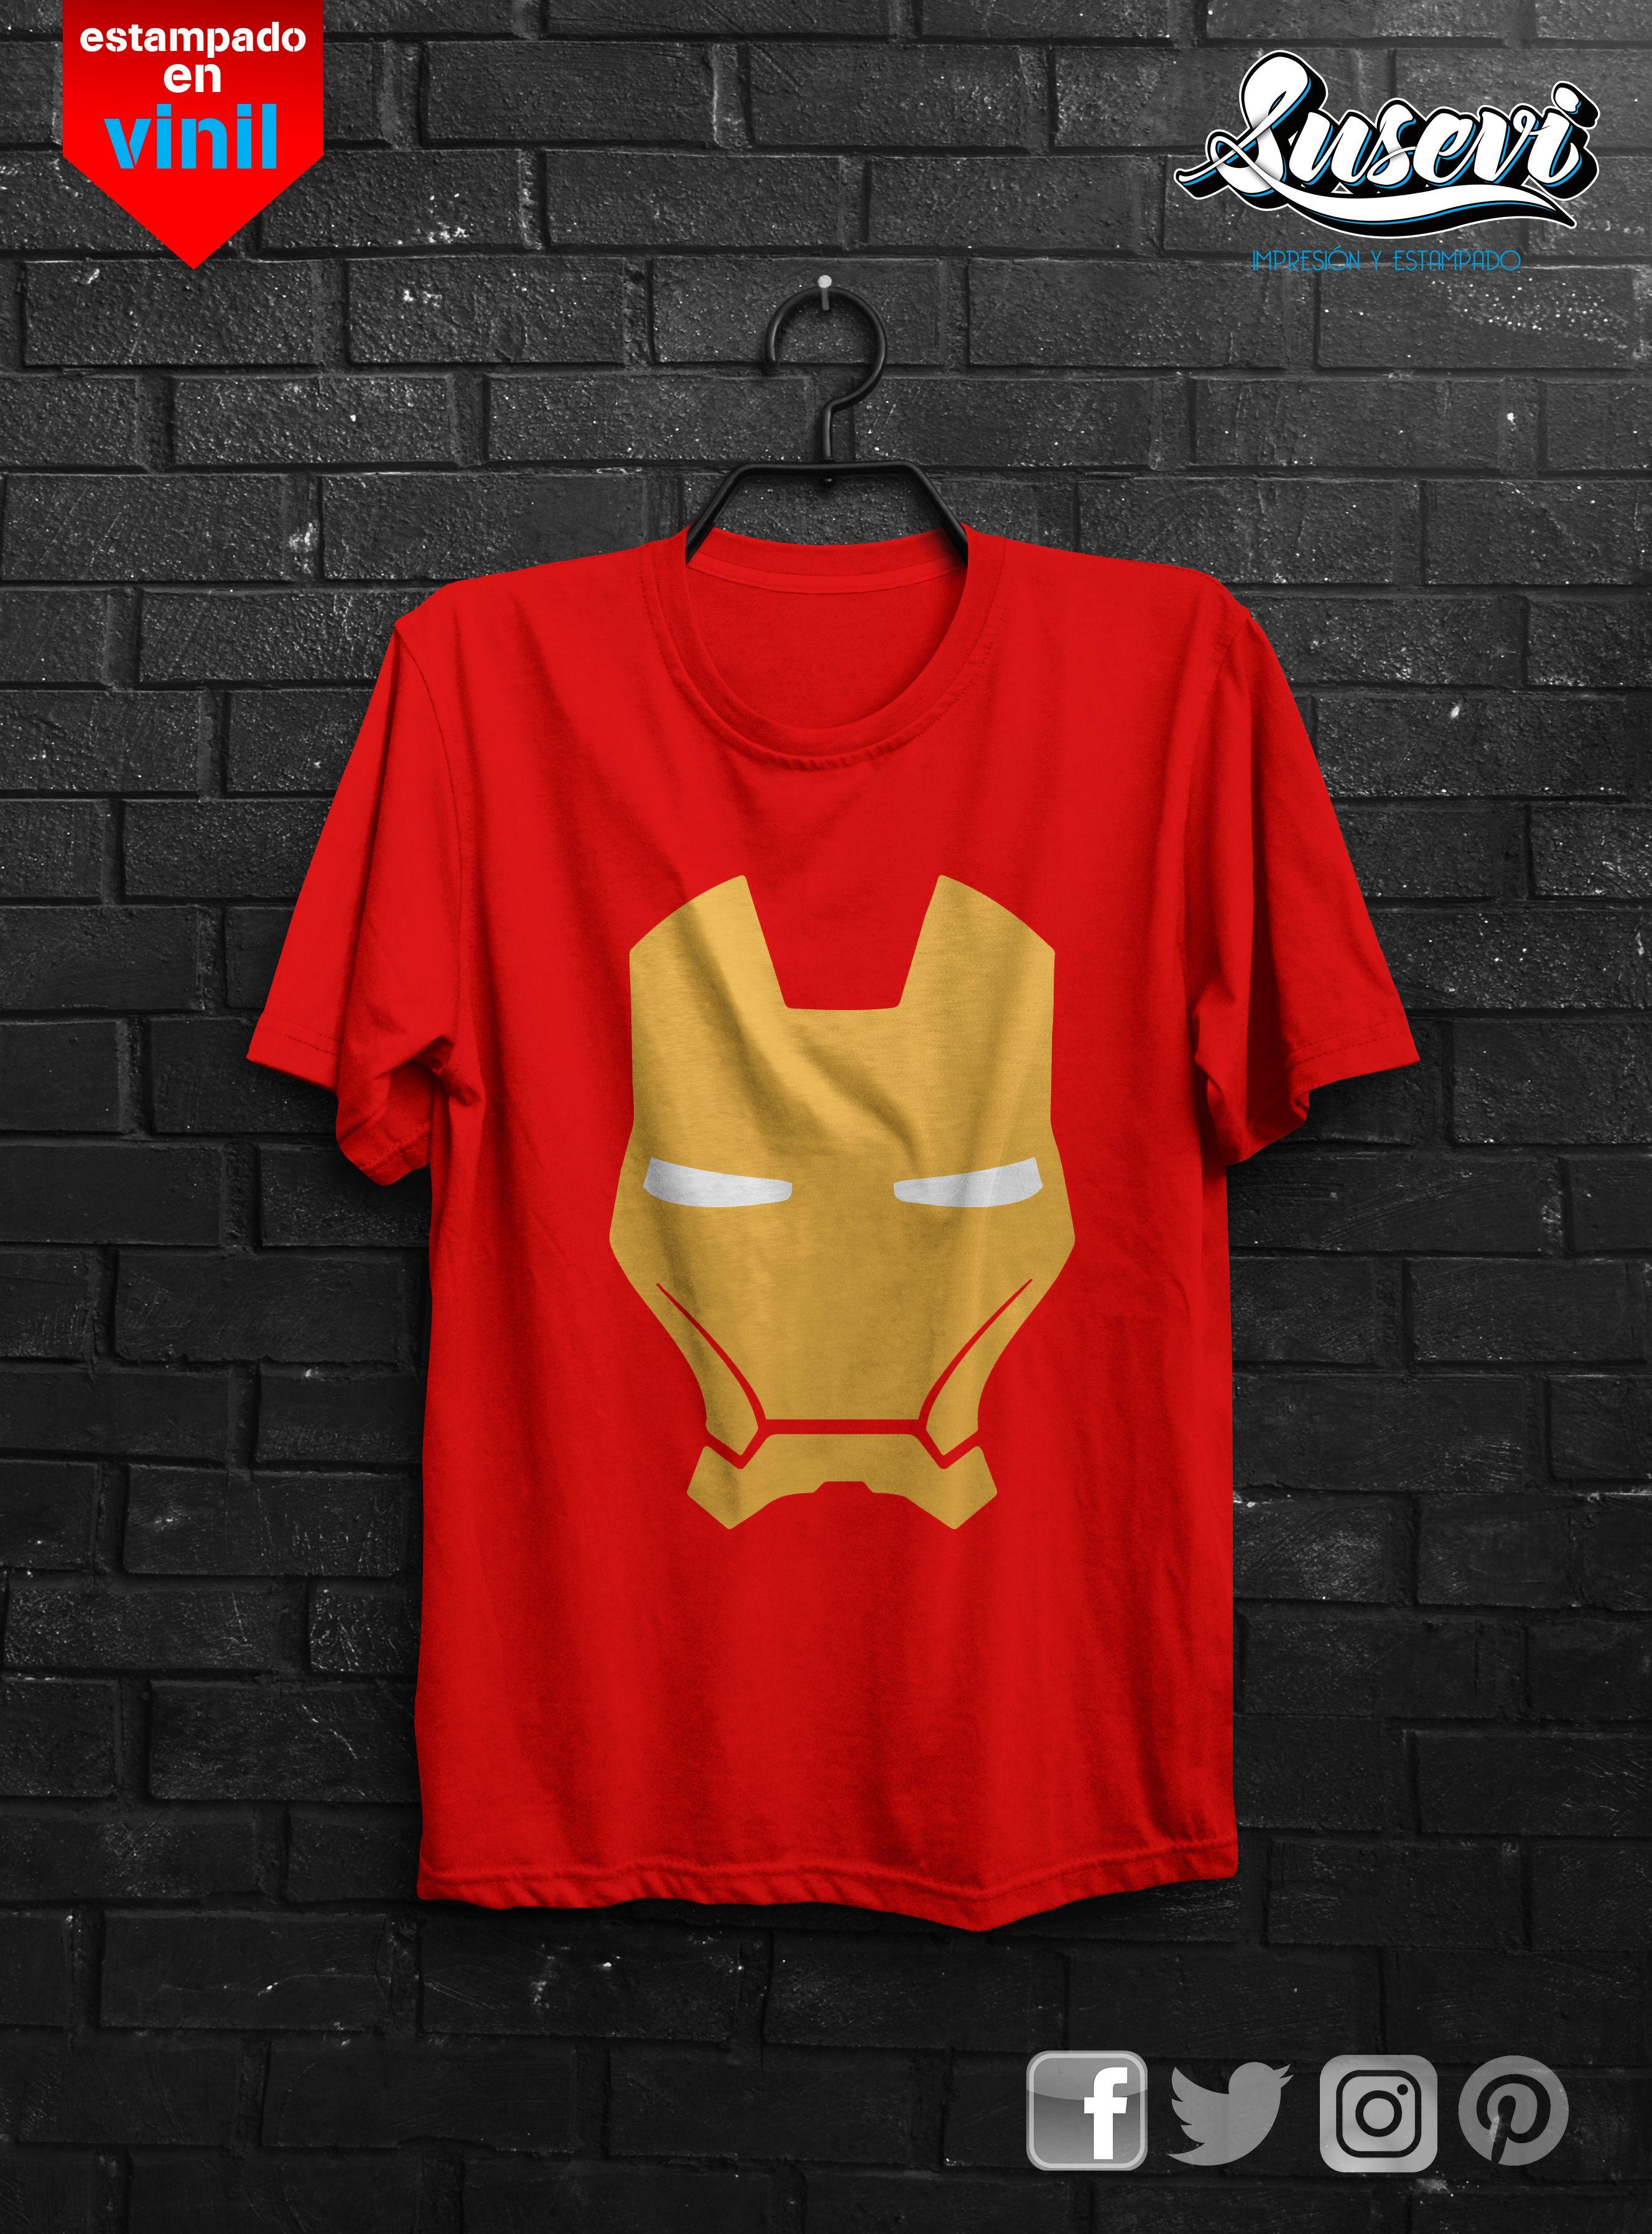 973e6d1a030 Playera personalizada-ironman-hombre-estampados #comics #playeras #ironman